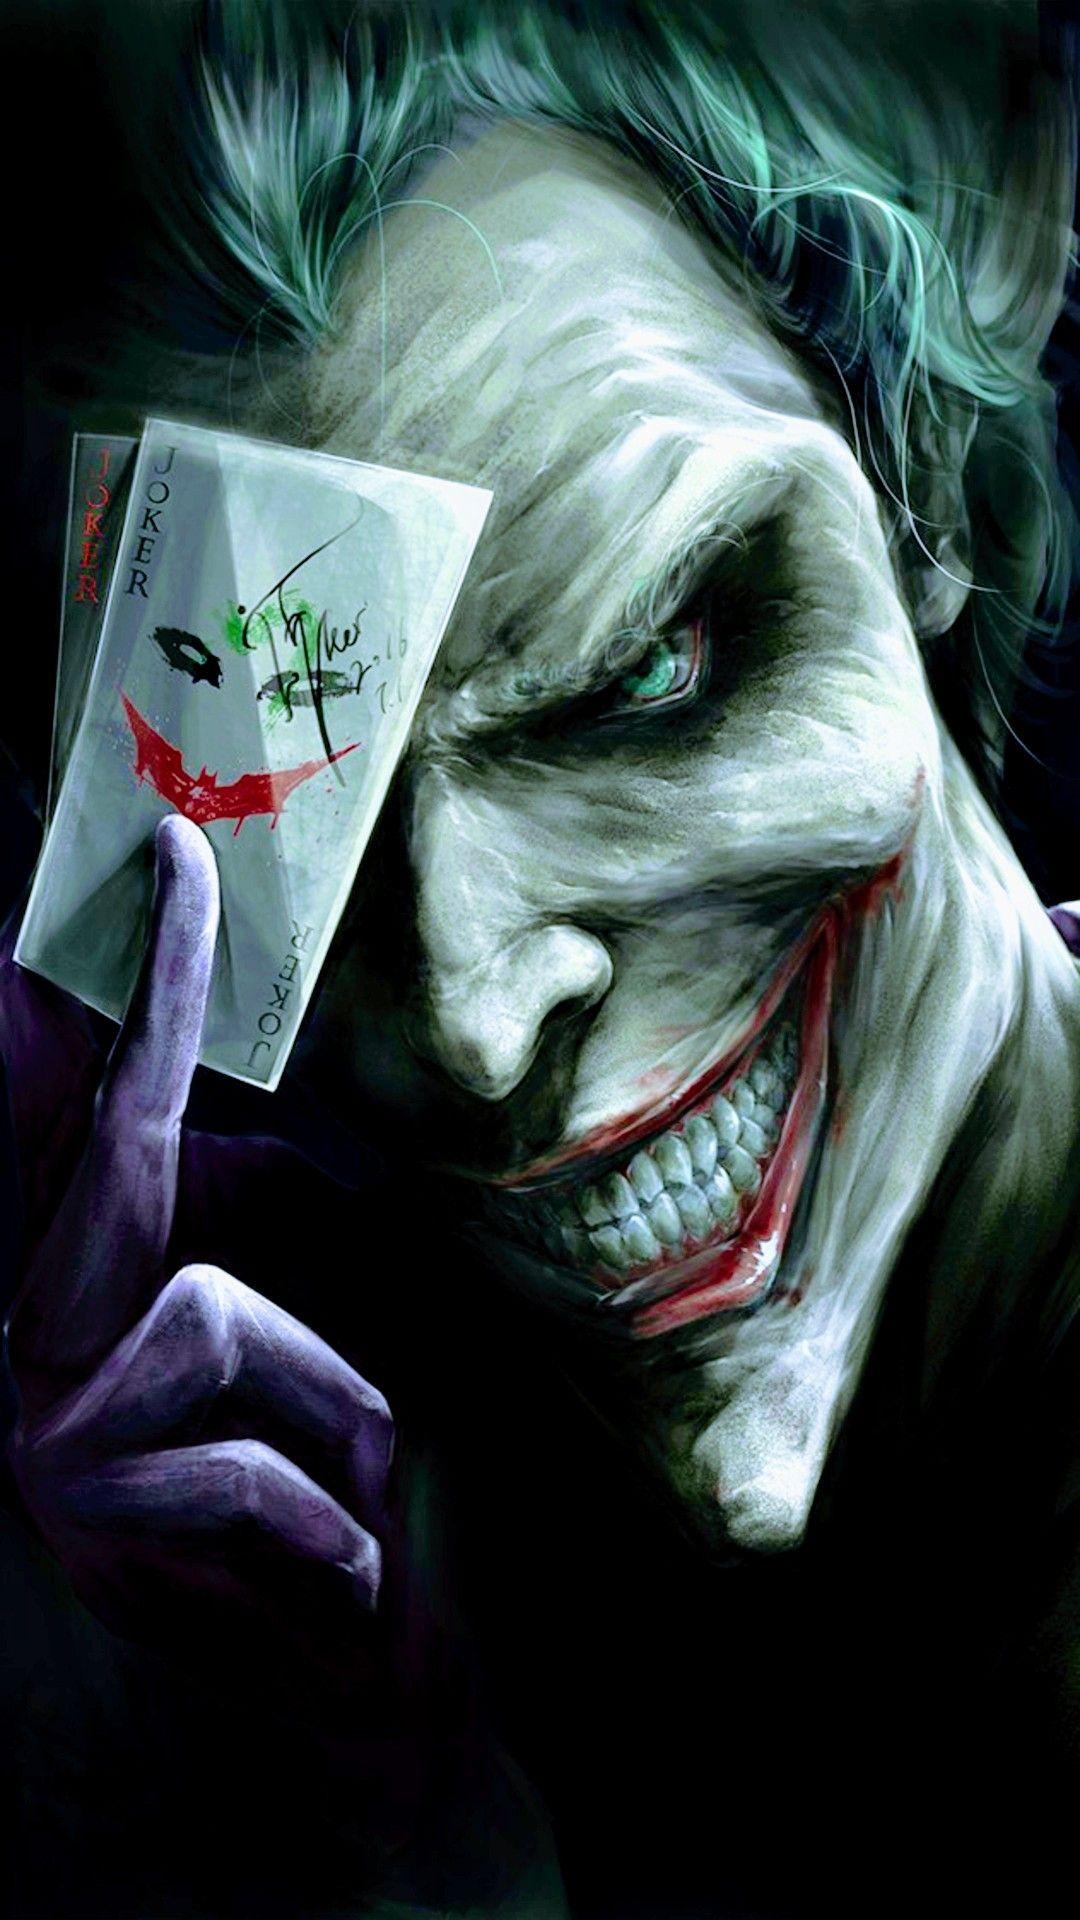 Joker Joaquin Phoenix Joker Wallpapers Batman Joker Wallpaper Joker Comic